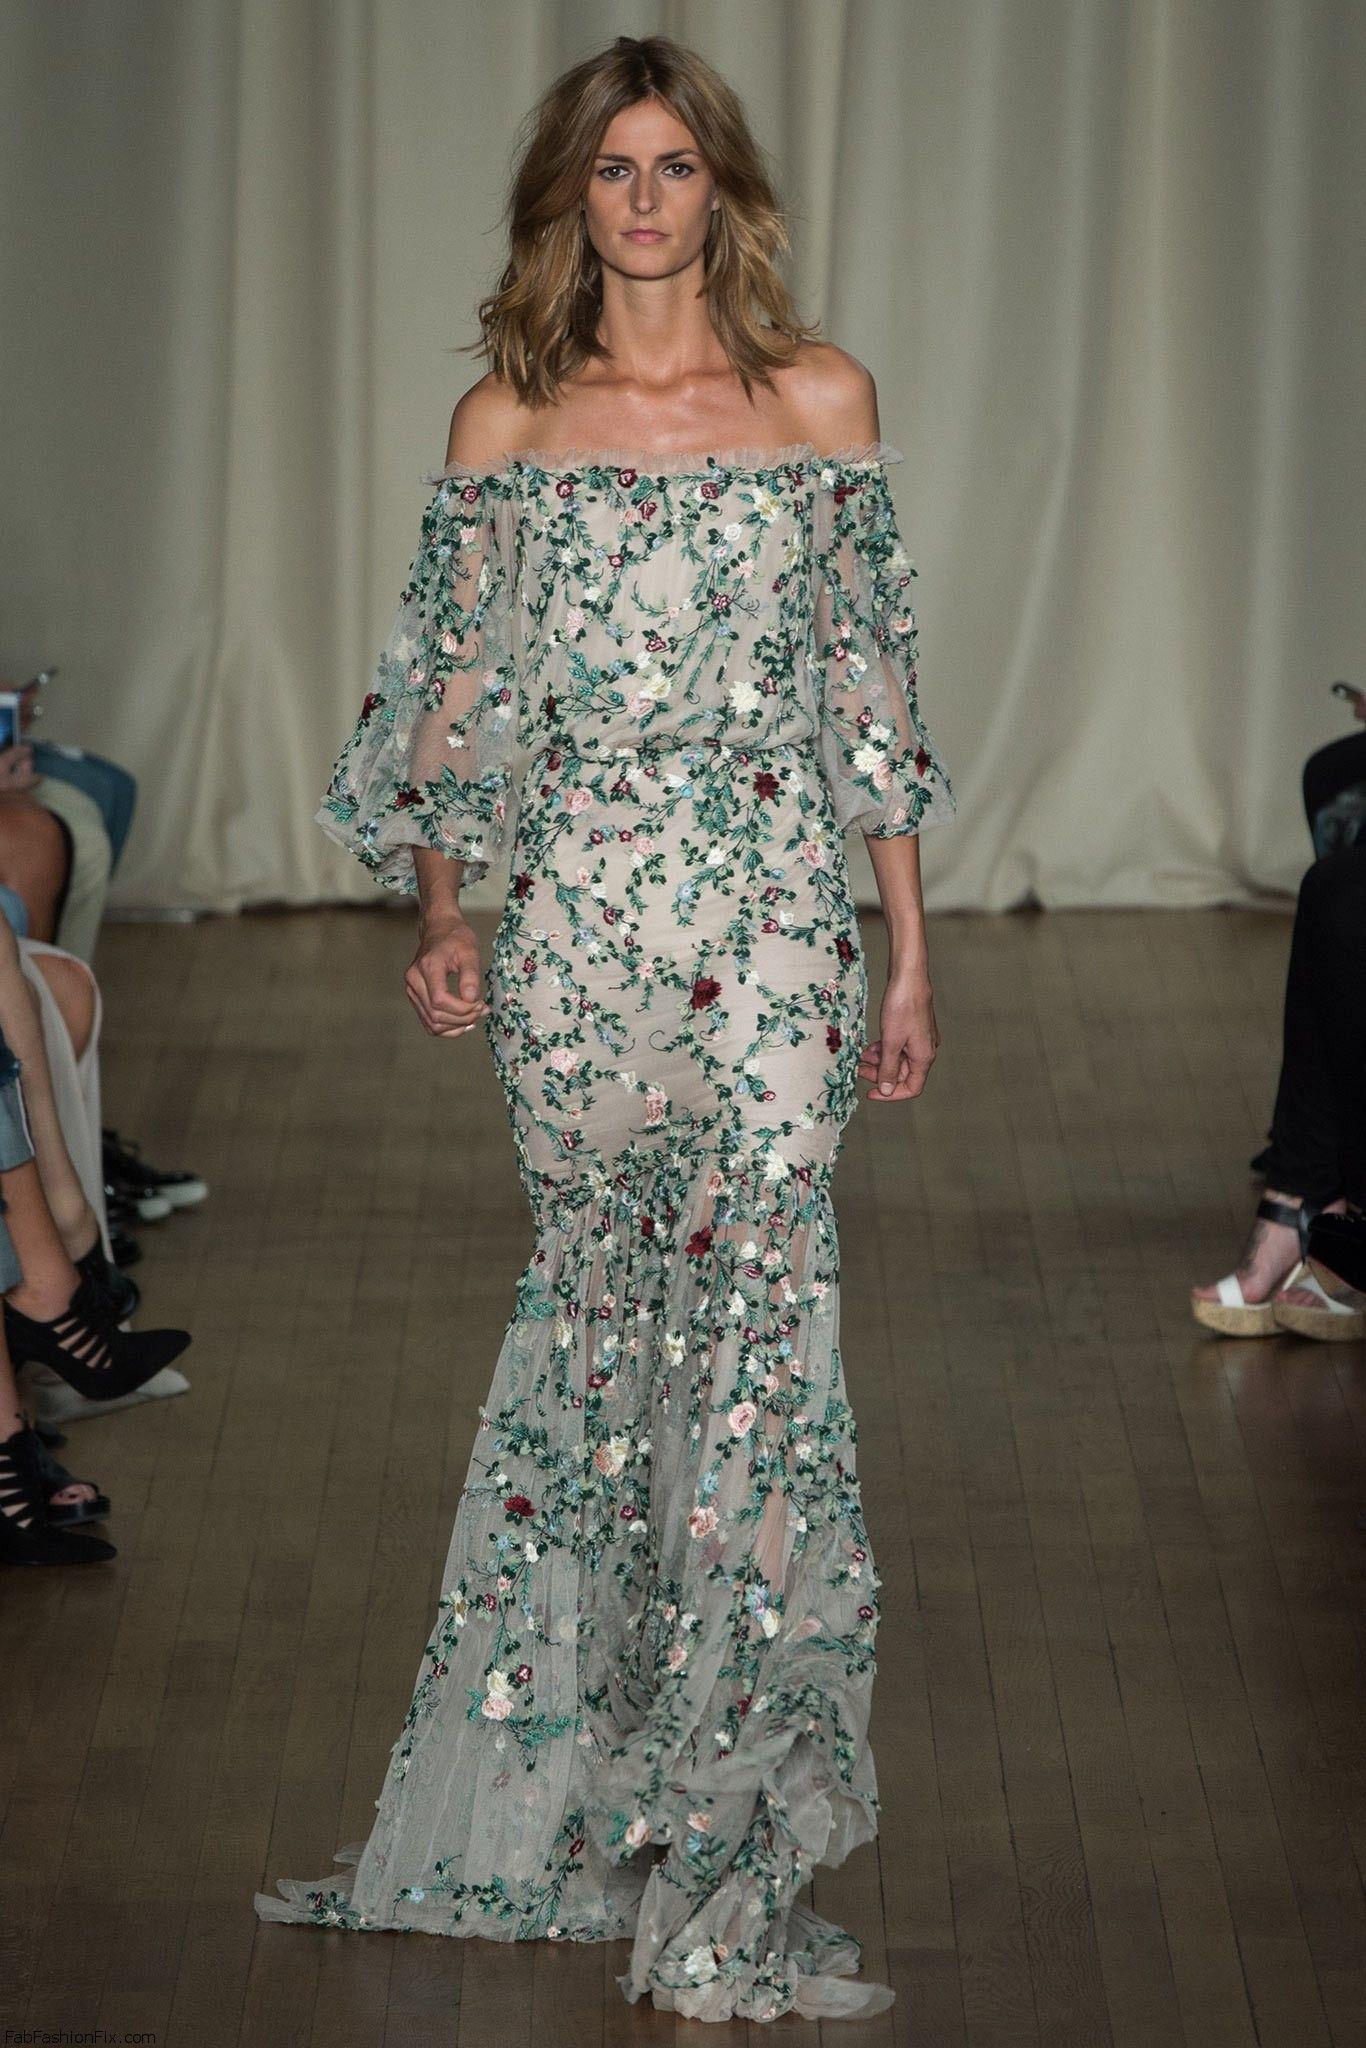 Marchesa spring/summer 2015 collection - London fashion week